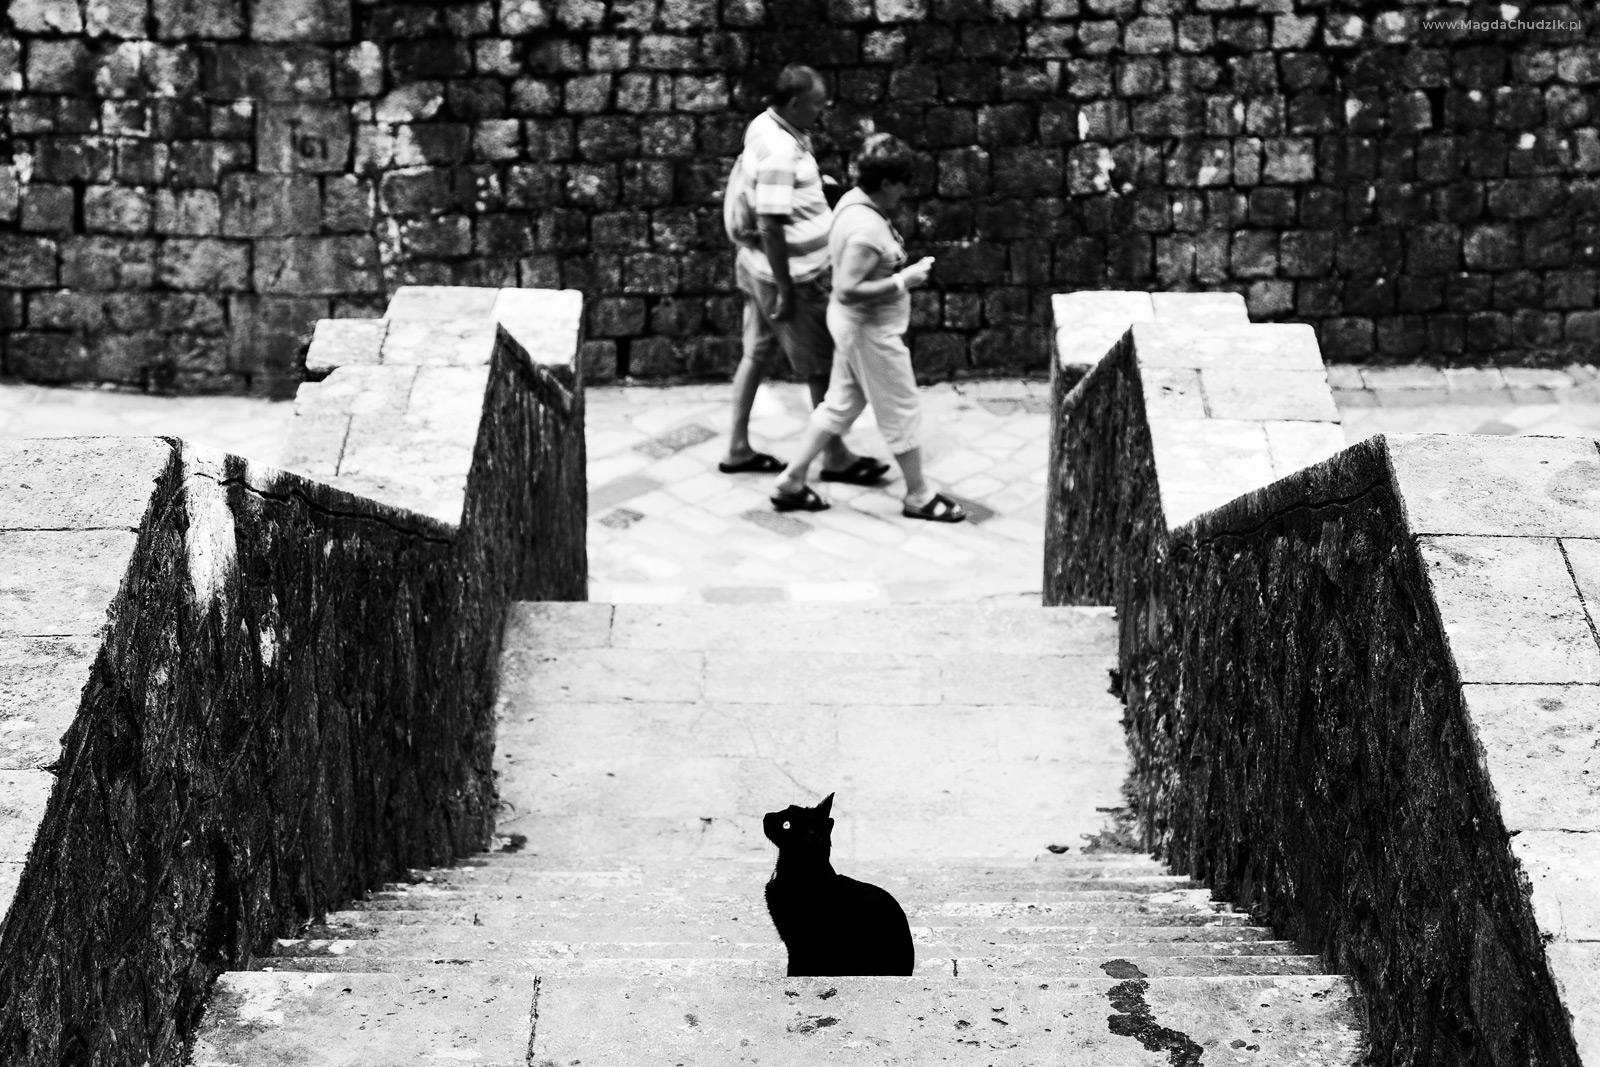 magda-chudzik-street-photography-montenegro-009